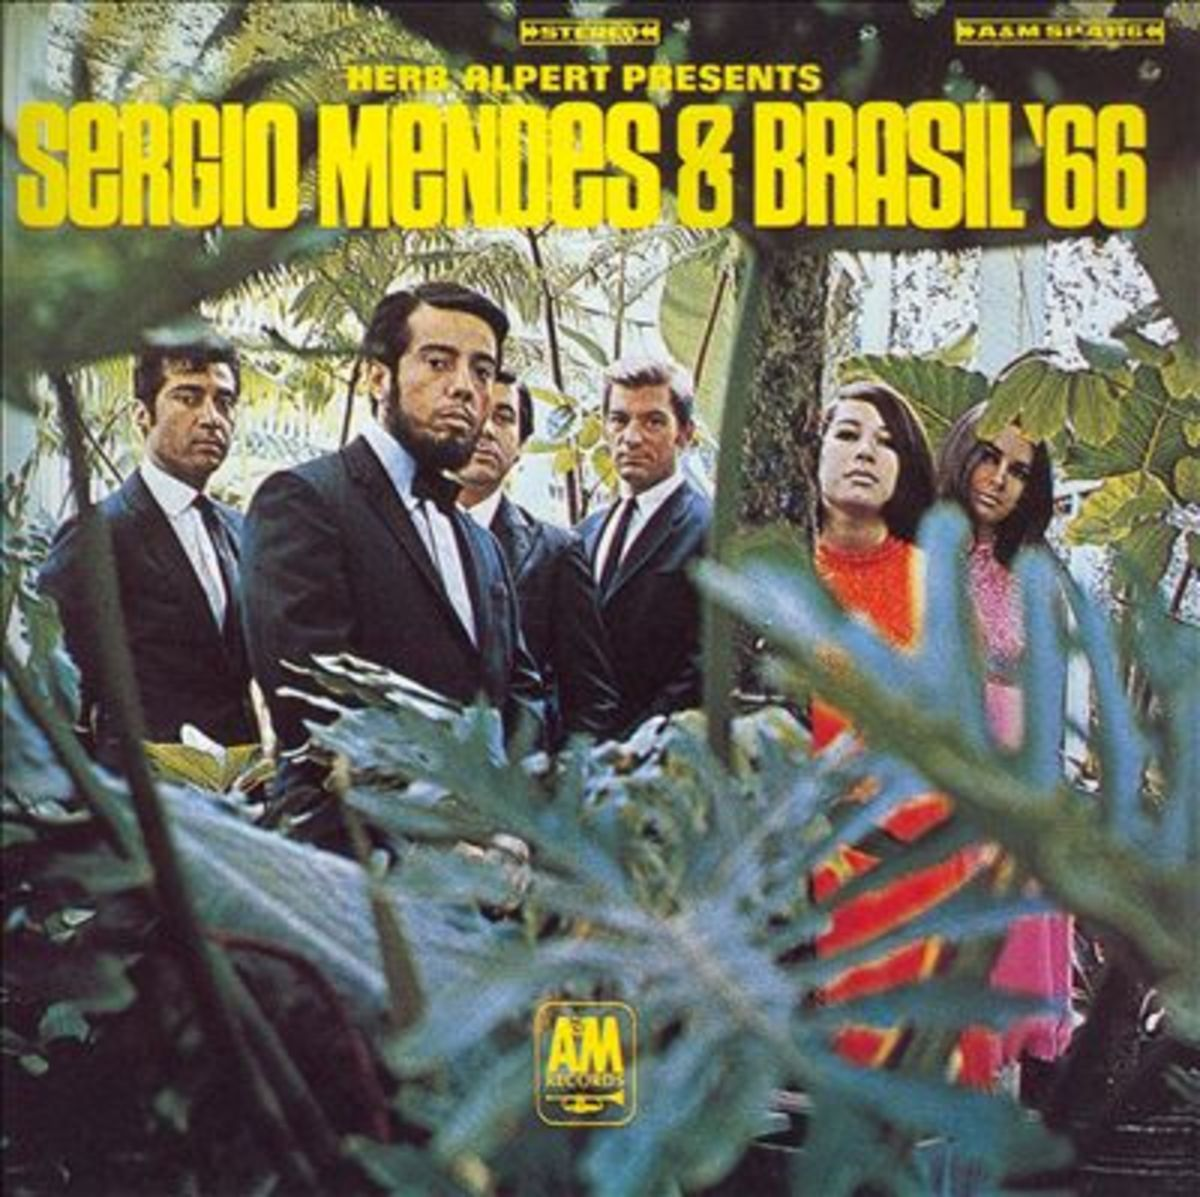 Sergio Mendes & Brasil 66 Feature in Season 6